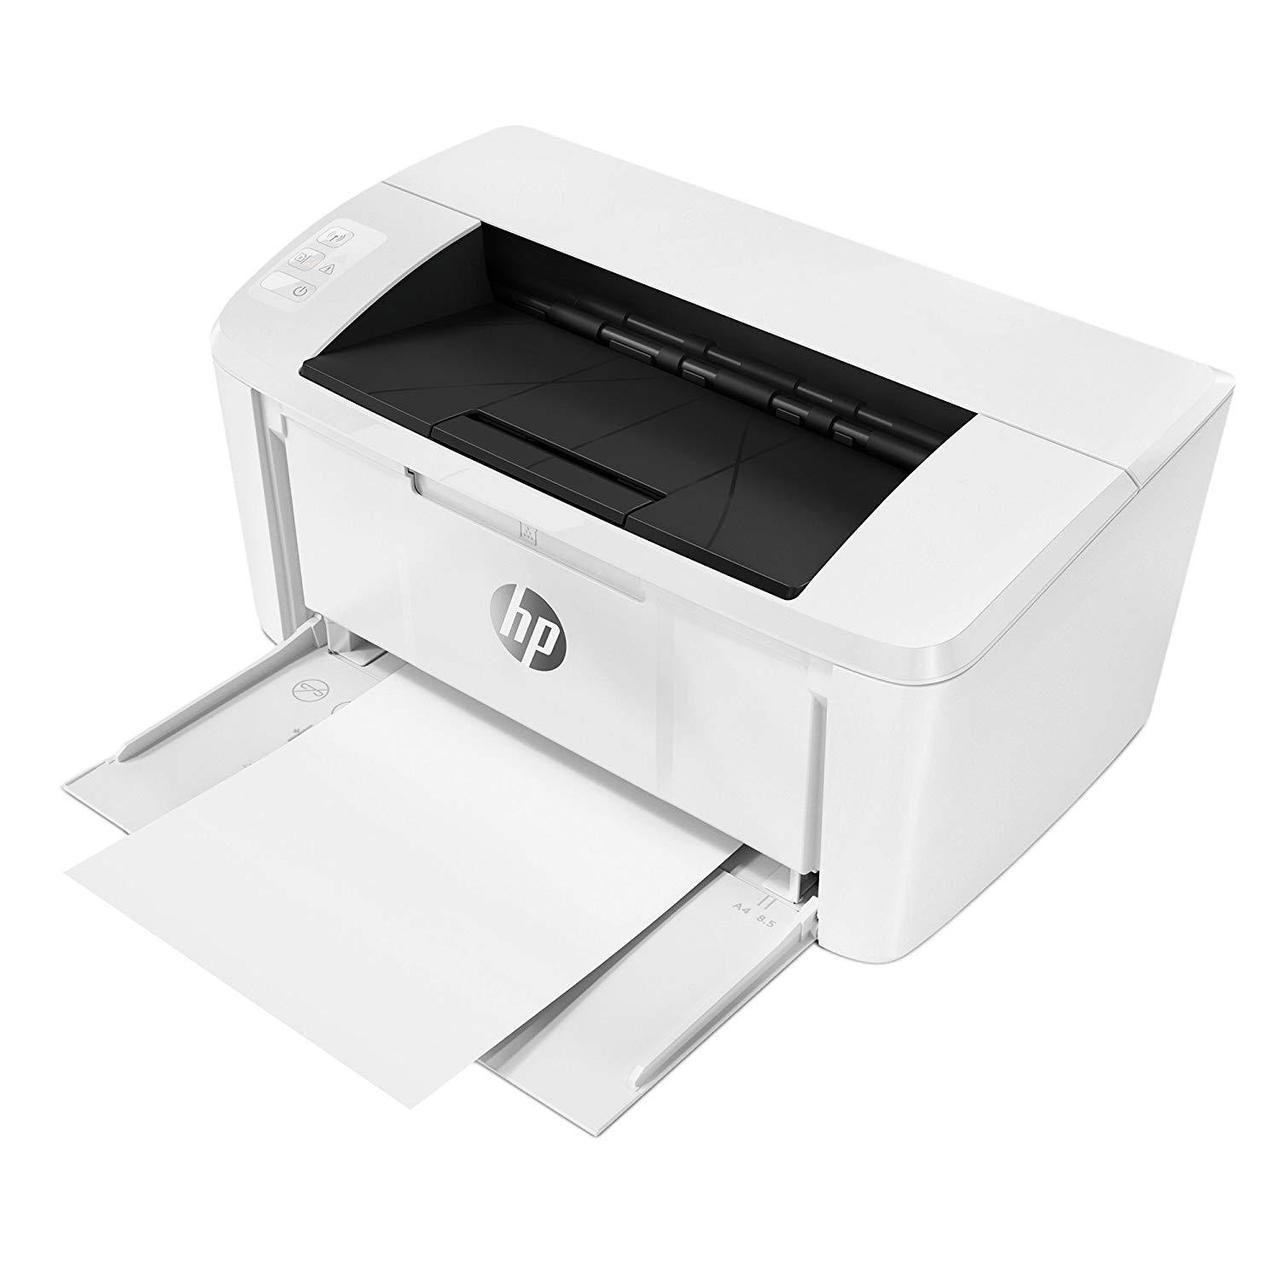 Принтер HP LaserJet Pro M15w * (W2G51A)